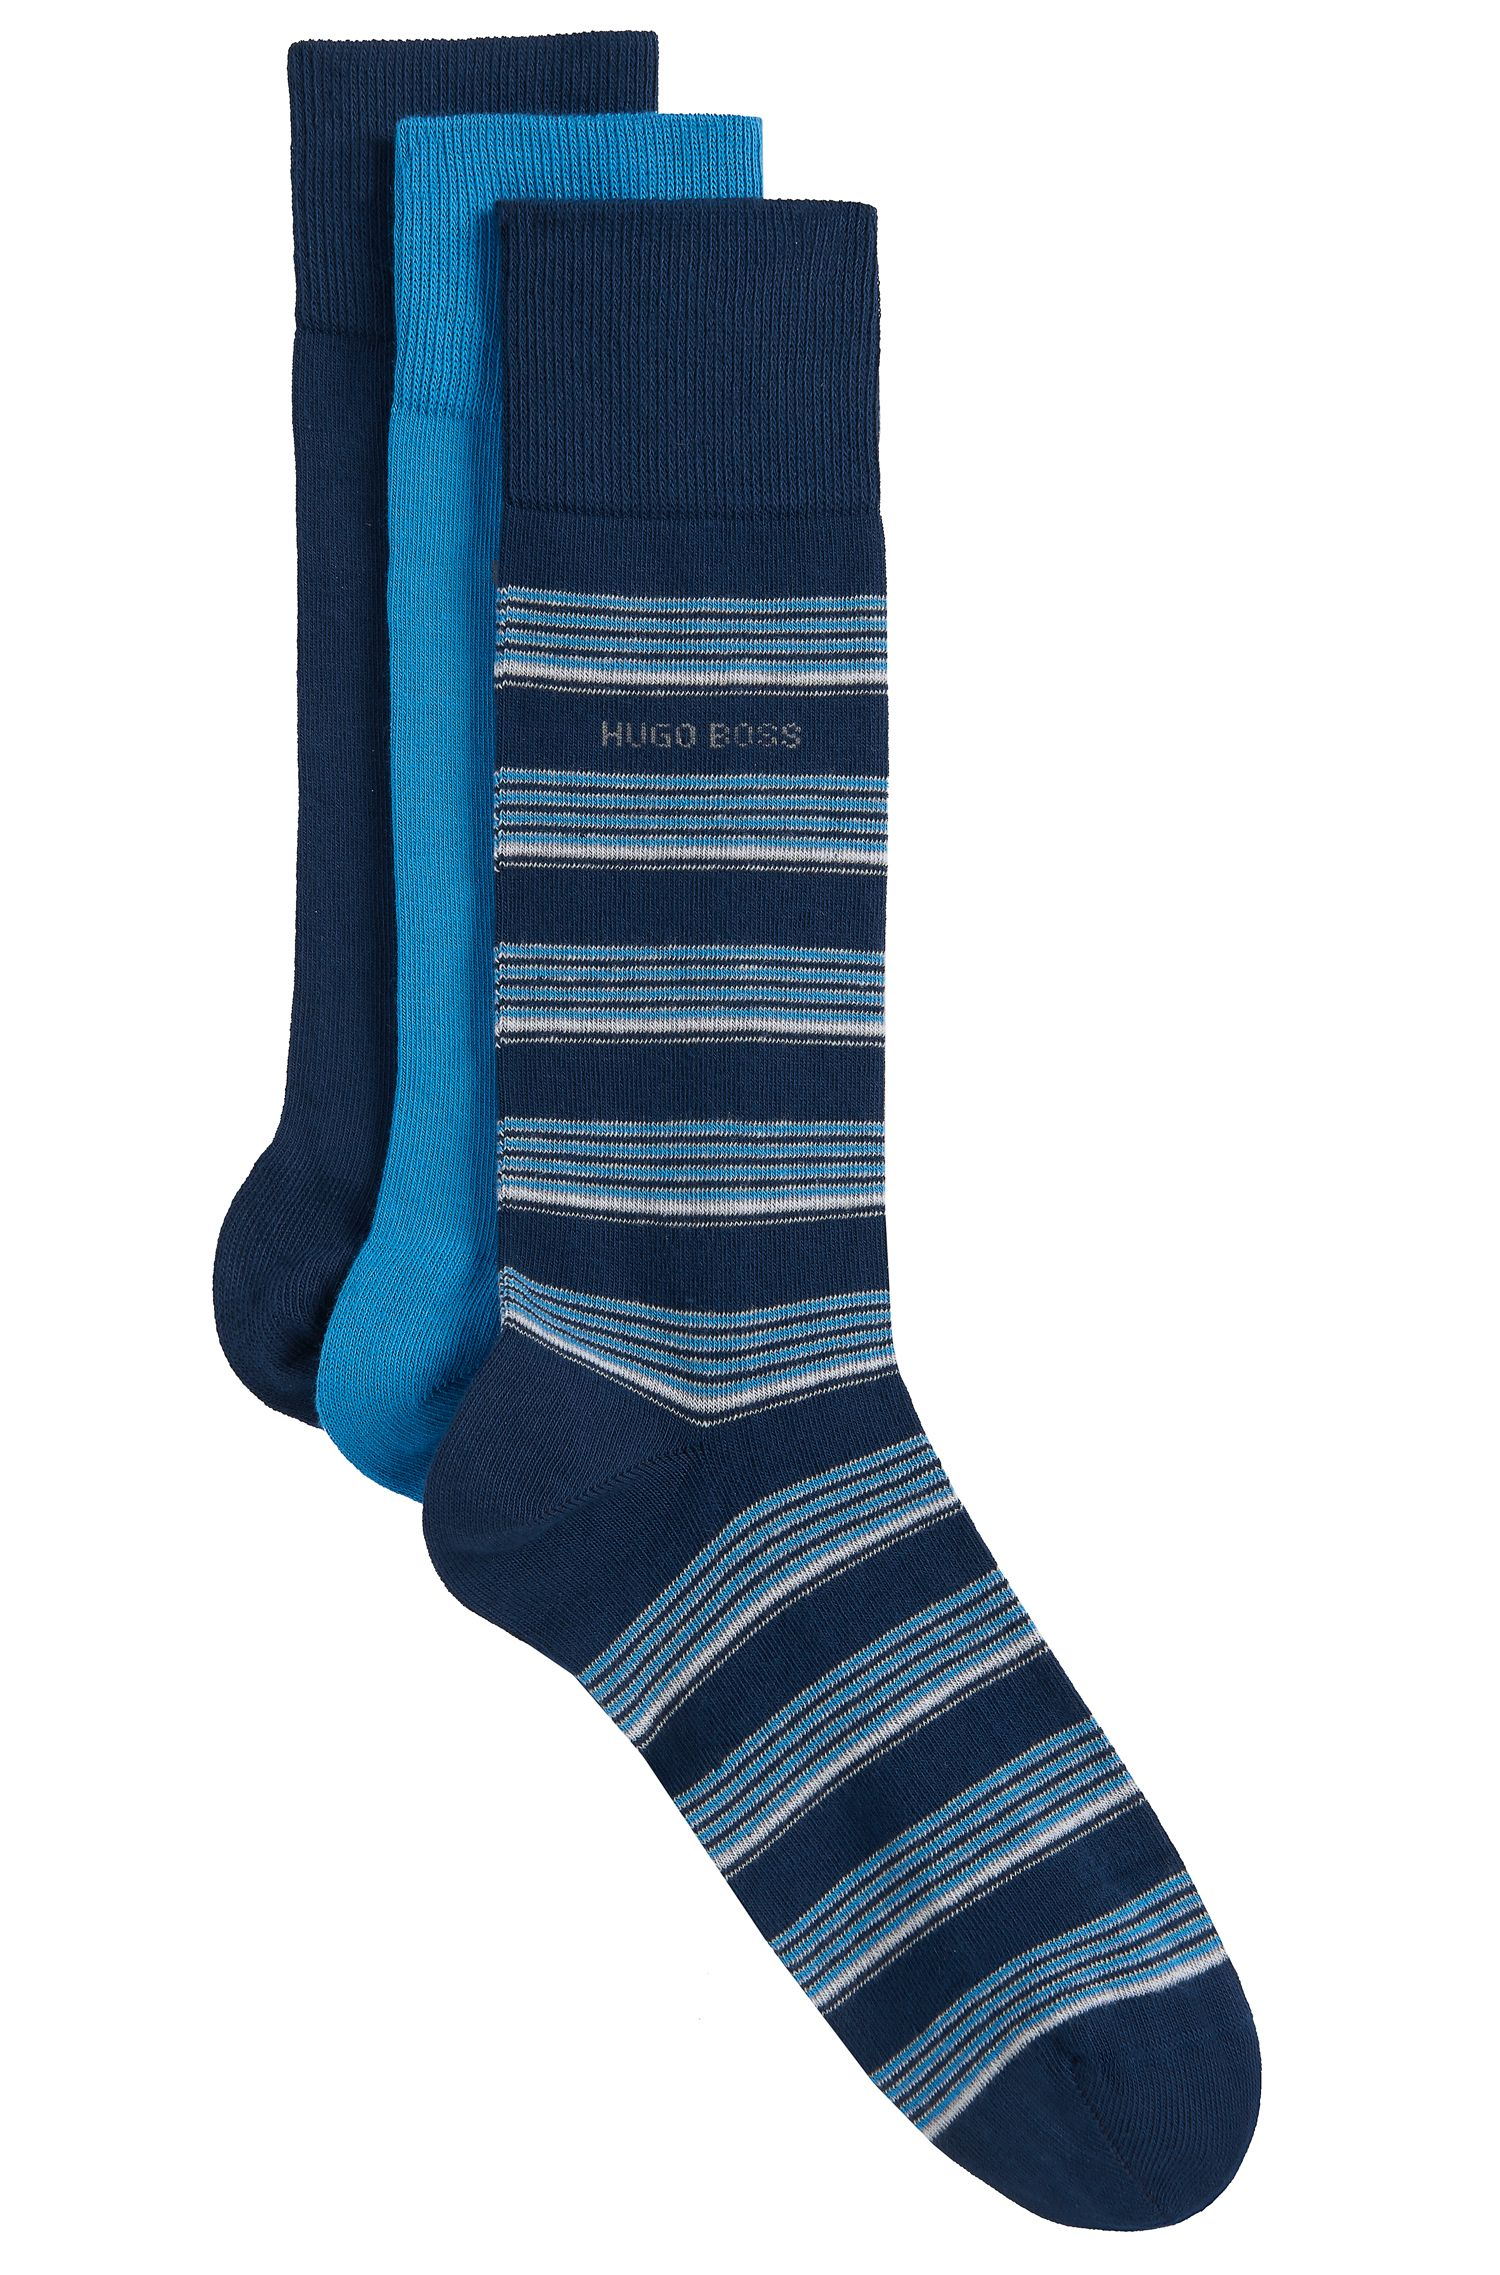 'S Design Box Us'   Stretch Cotton Blend Socks, 3 Pack